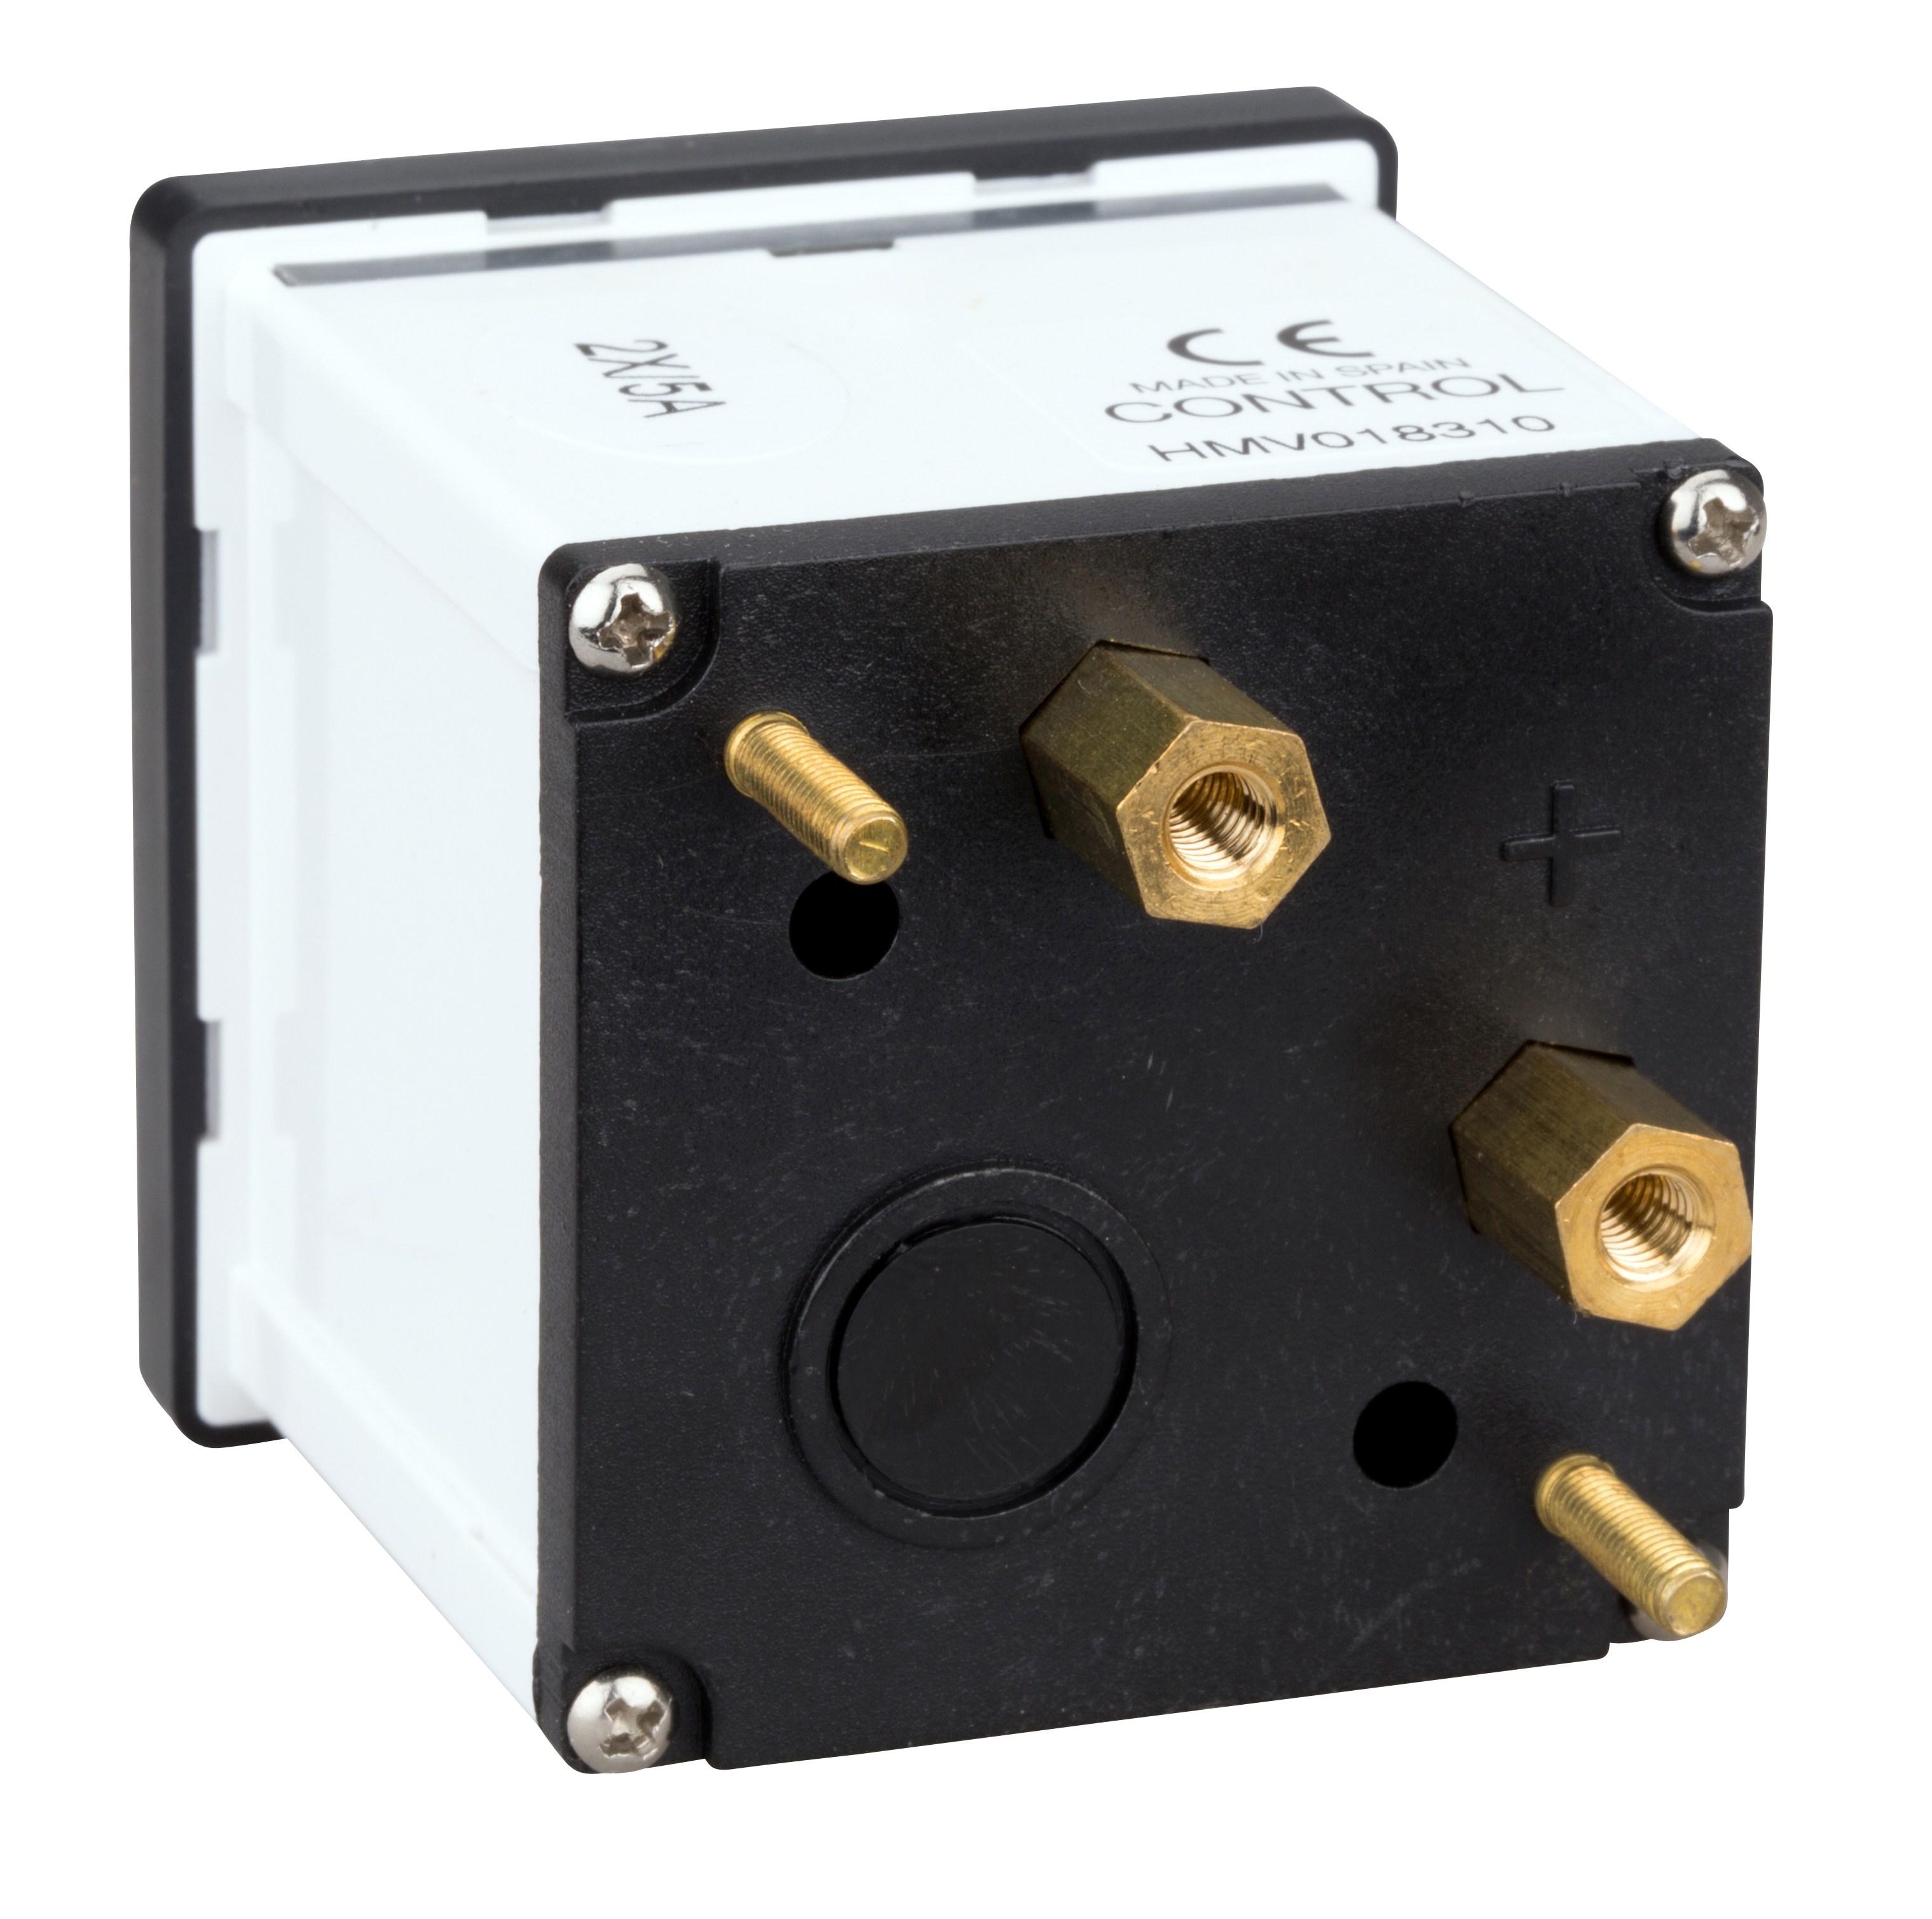 1 Stk Amperemeter, 48x48mm, für Wandlermessung (5A-Wandler) MGF54000-A